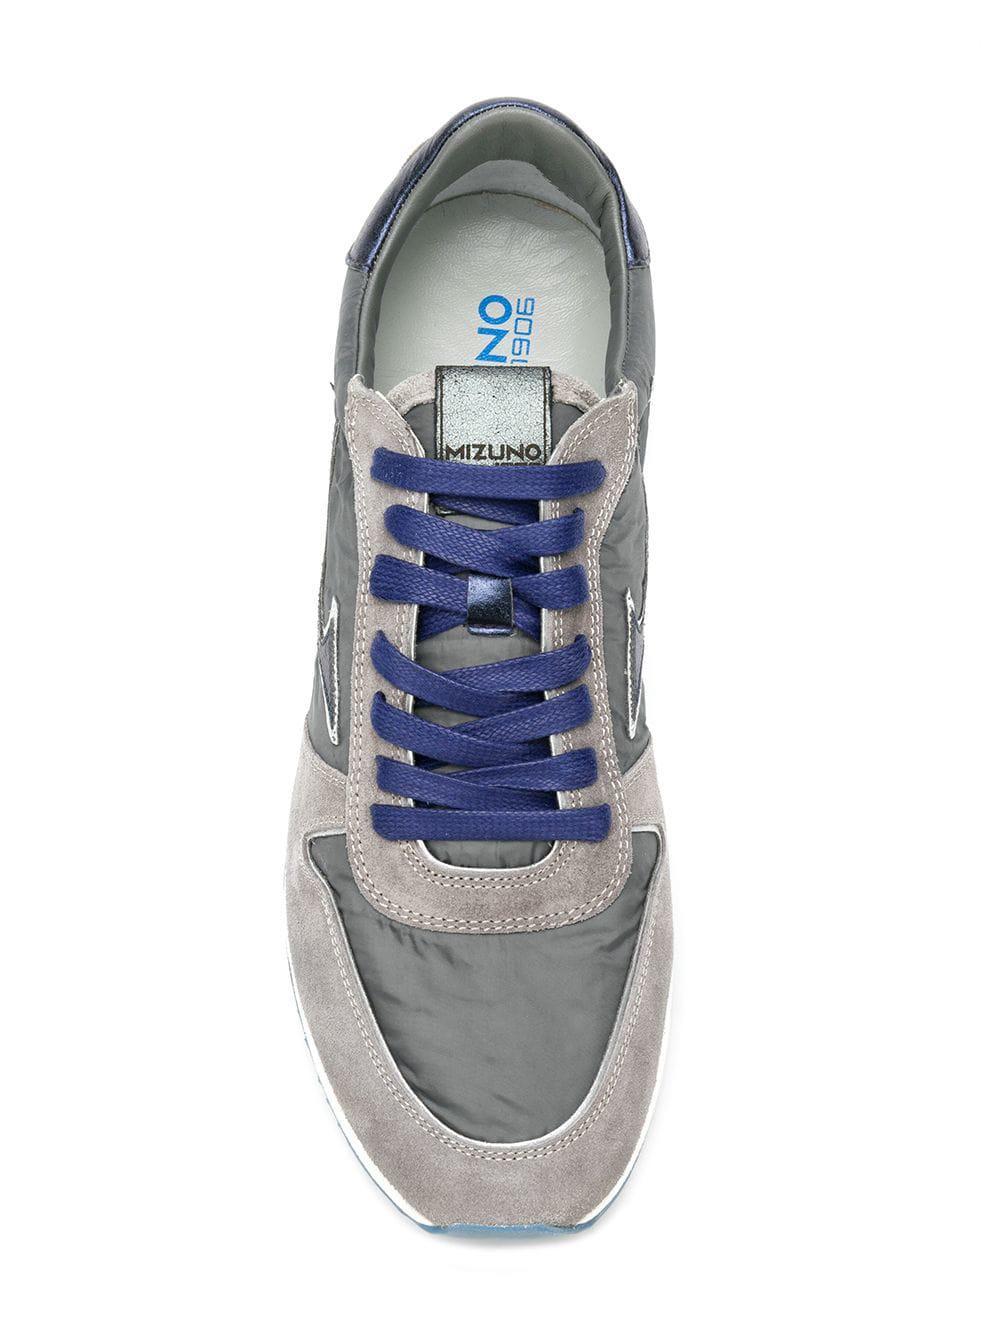 Mizuno ' 1906' Sneakers In Grau Für Herren Herren Lyst Lyst Lyst